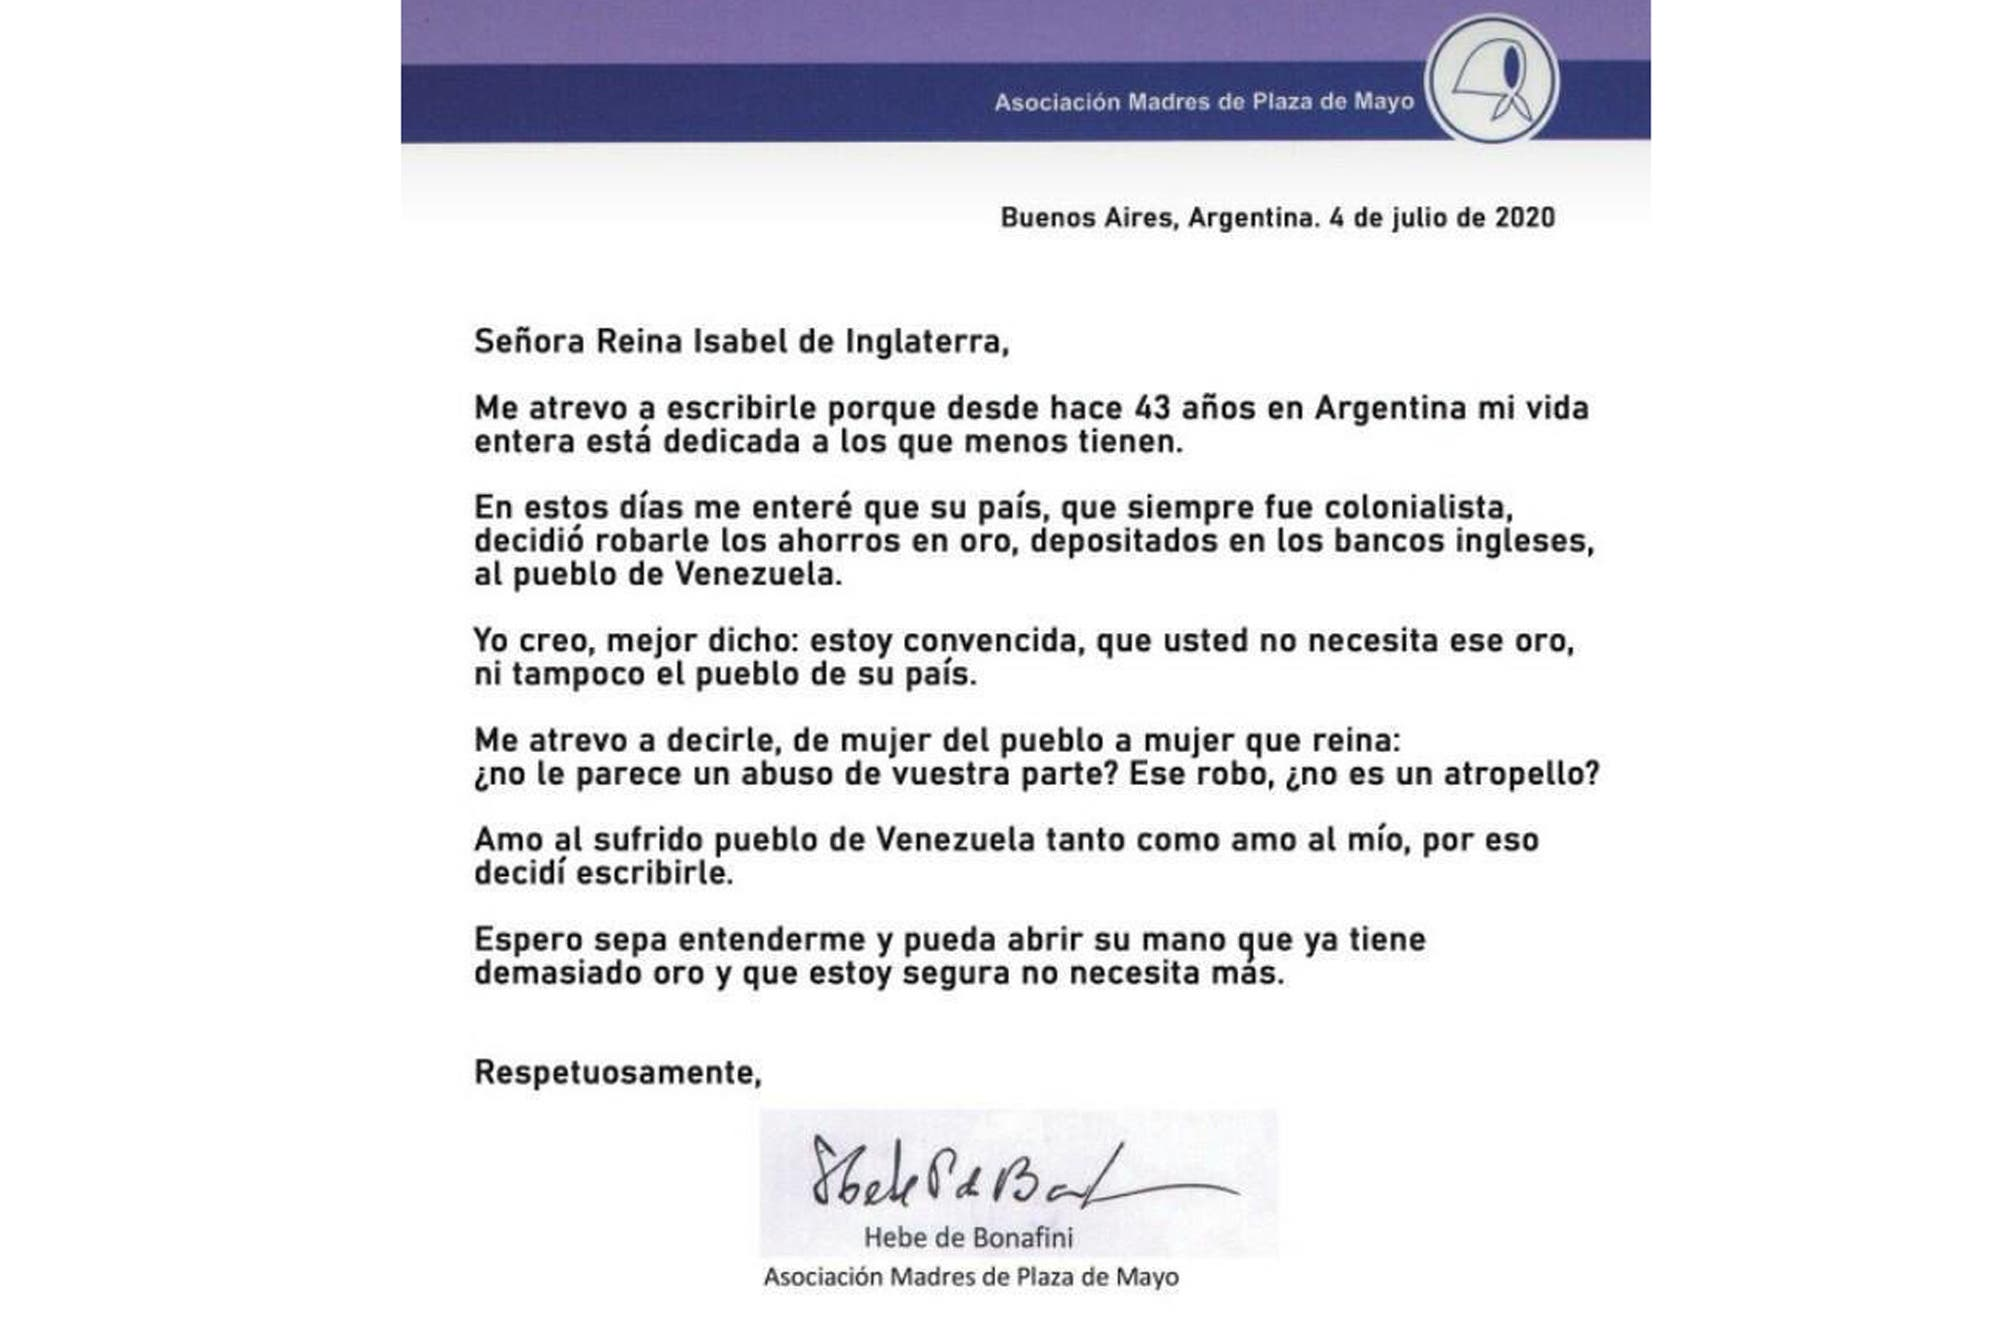 Oro de Venezuela: Hebe de Bonafini le mandó una dura carta a la Reina de Inglaterra